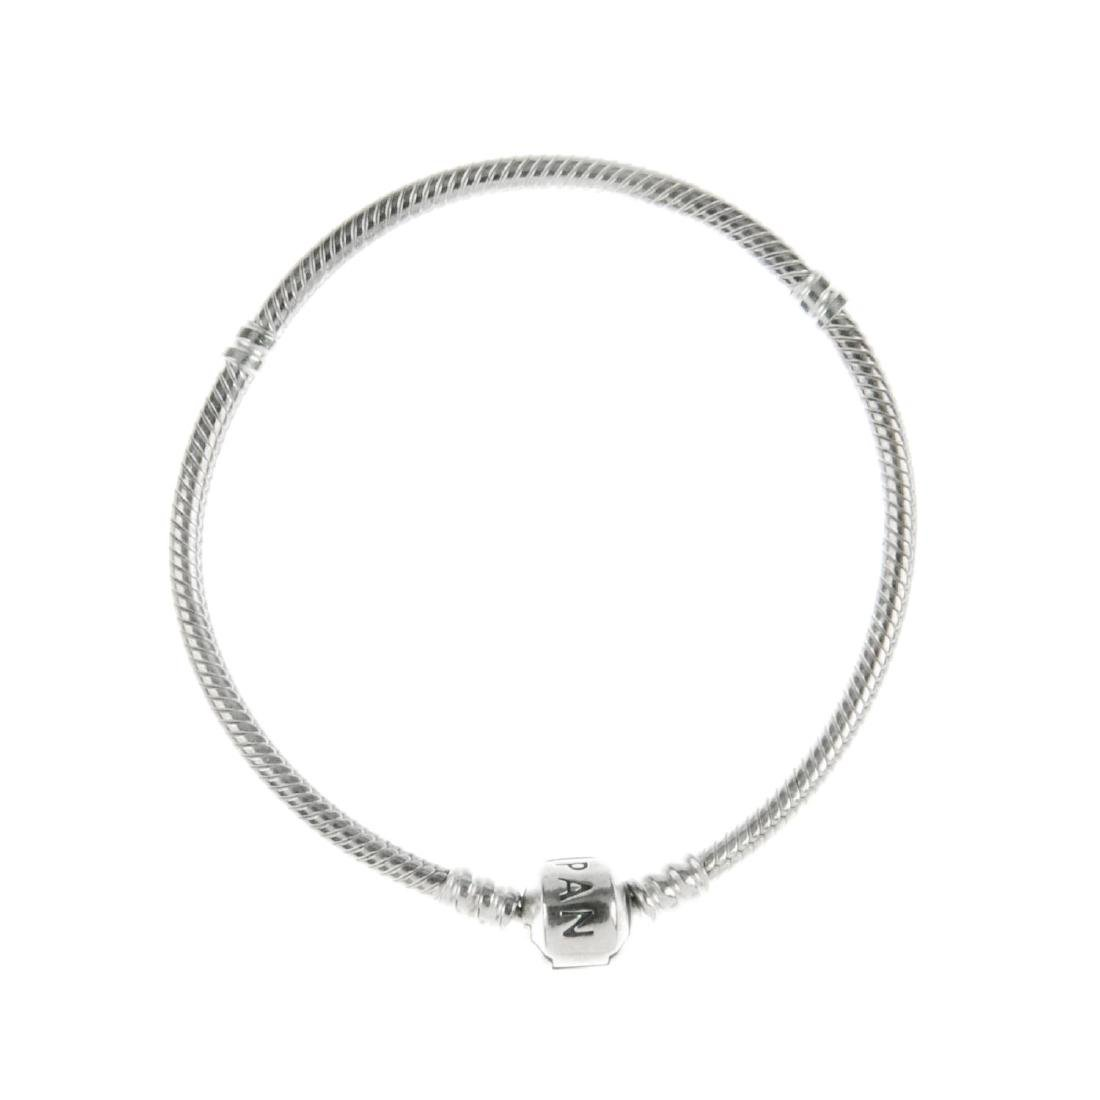 PANDORA - three charm bracelets. The first a